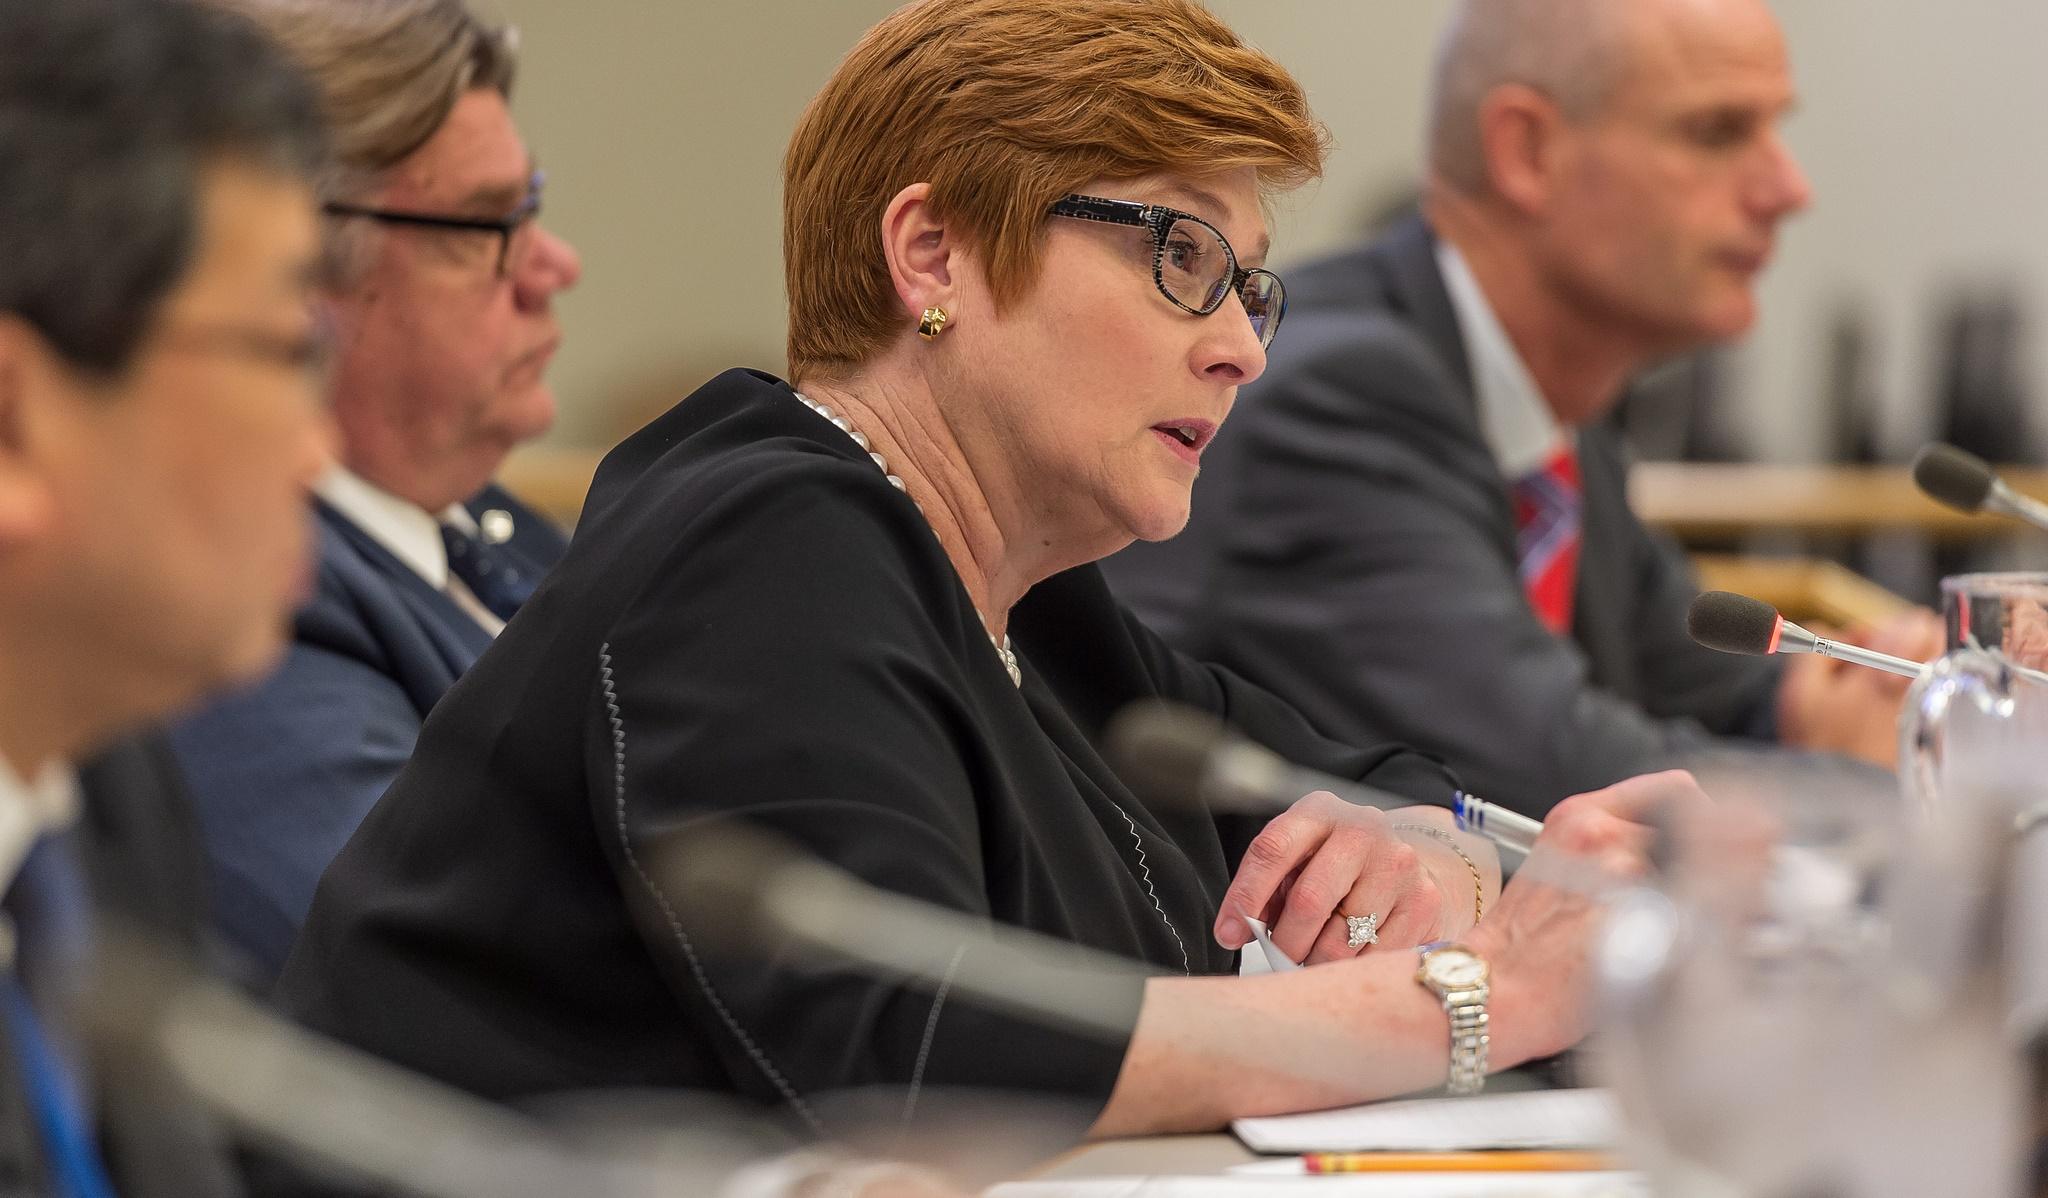 Australian Foreign Minister Marise Payne. (Flickr/CTBTO)